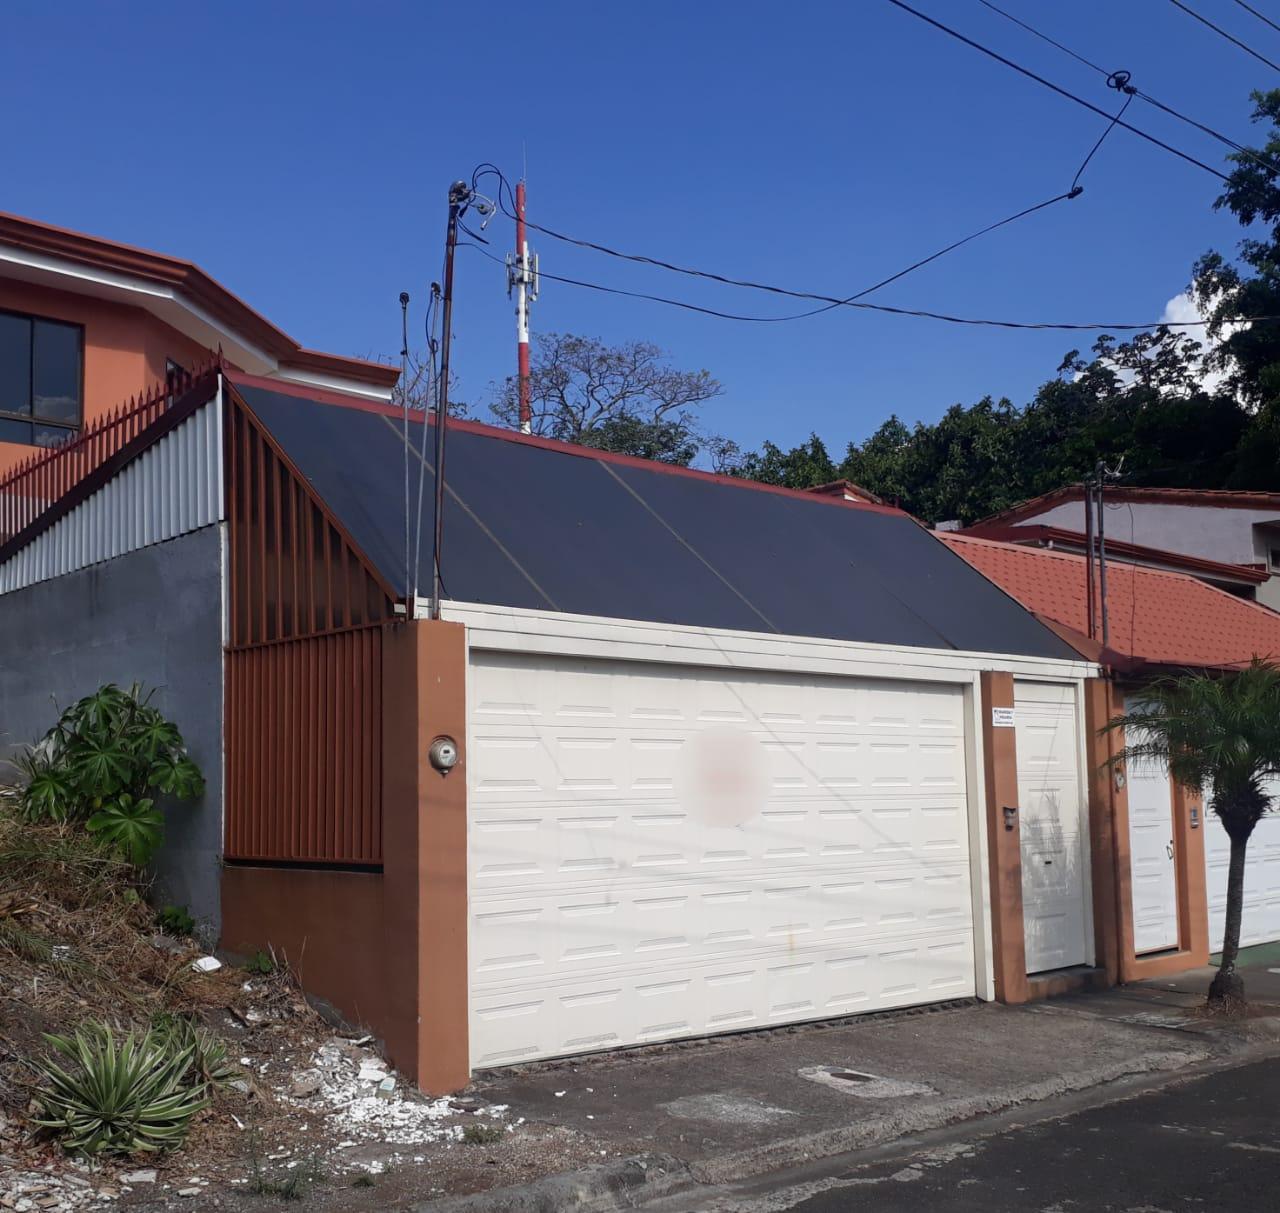 2324 Se Vende o Alquila Casa en Santa Ana